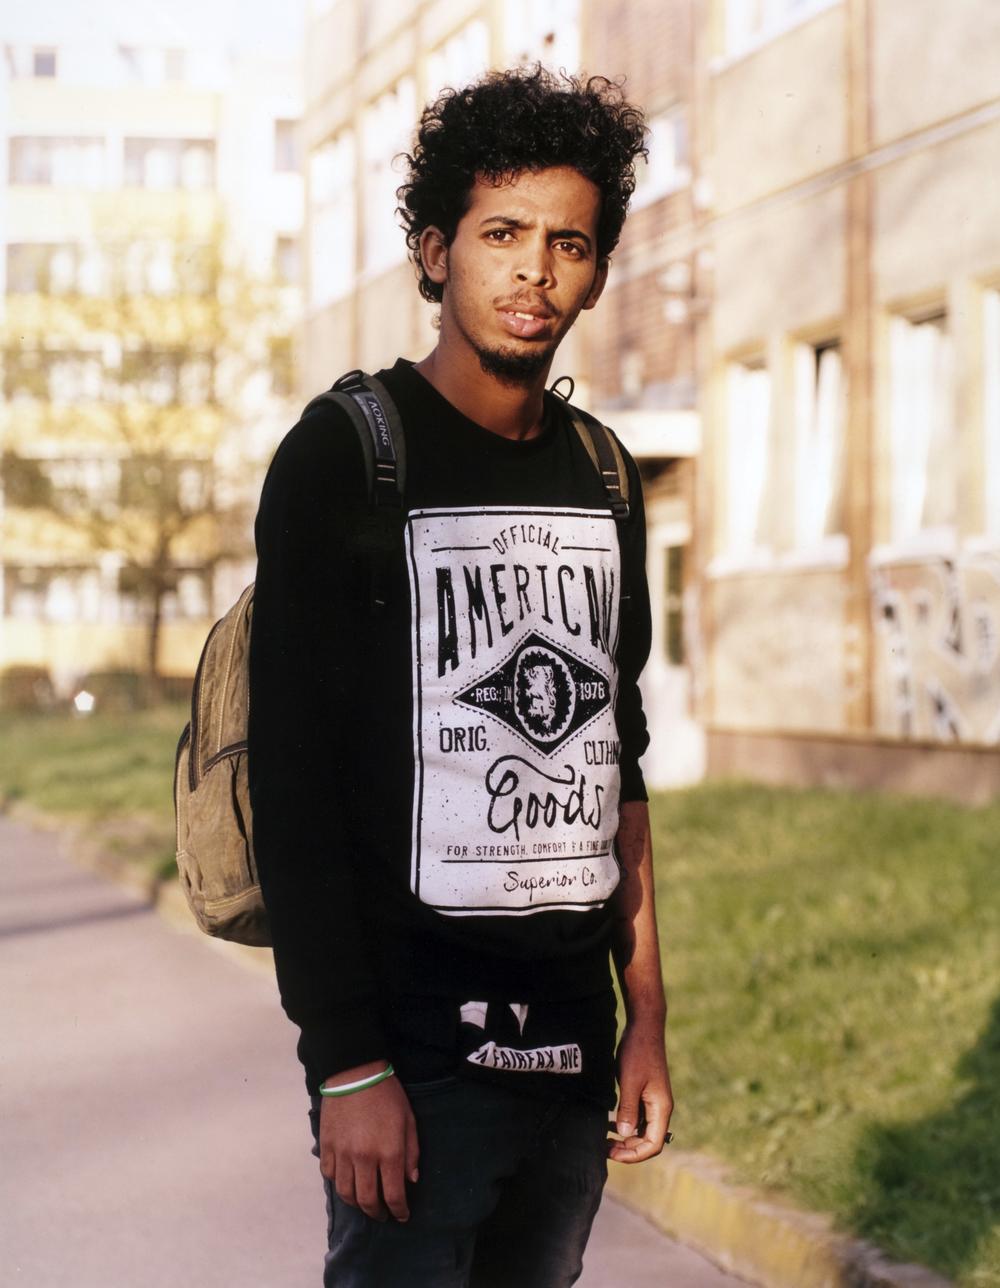 Mensur, from Eritrea, Refugeecamp Berlin - Hellersdorf